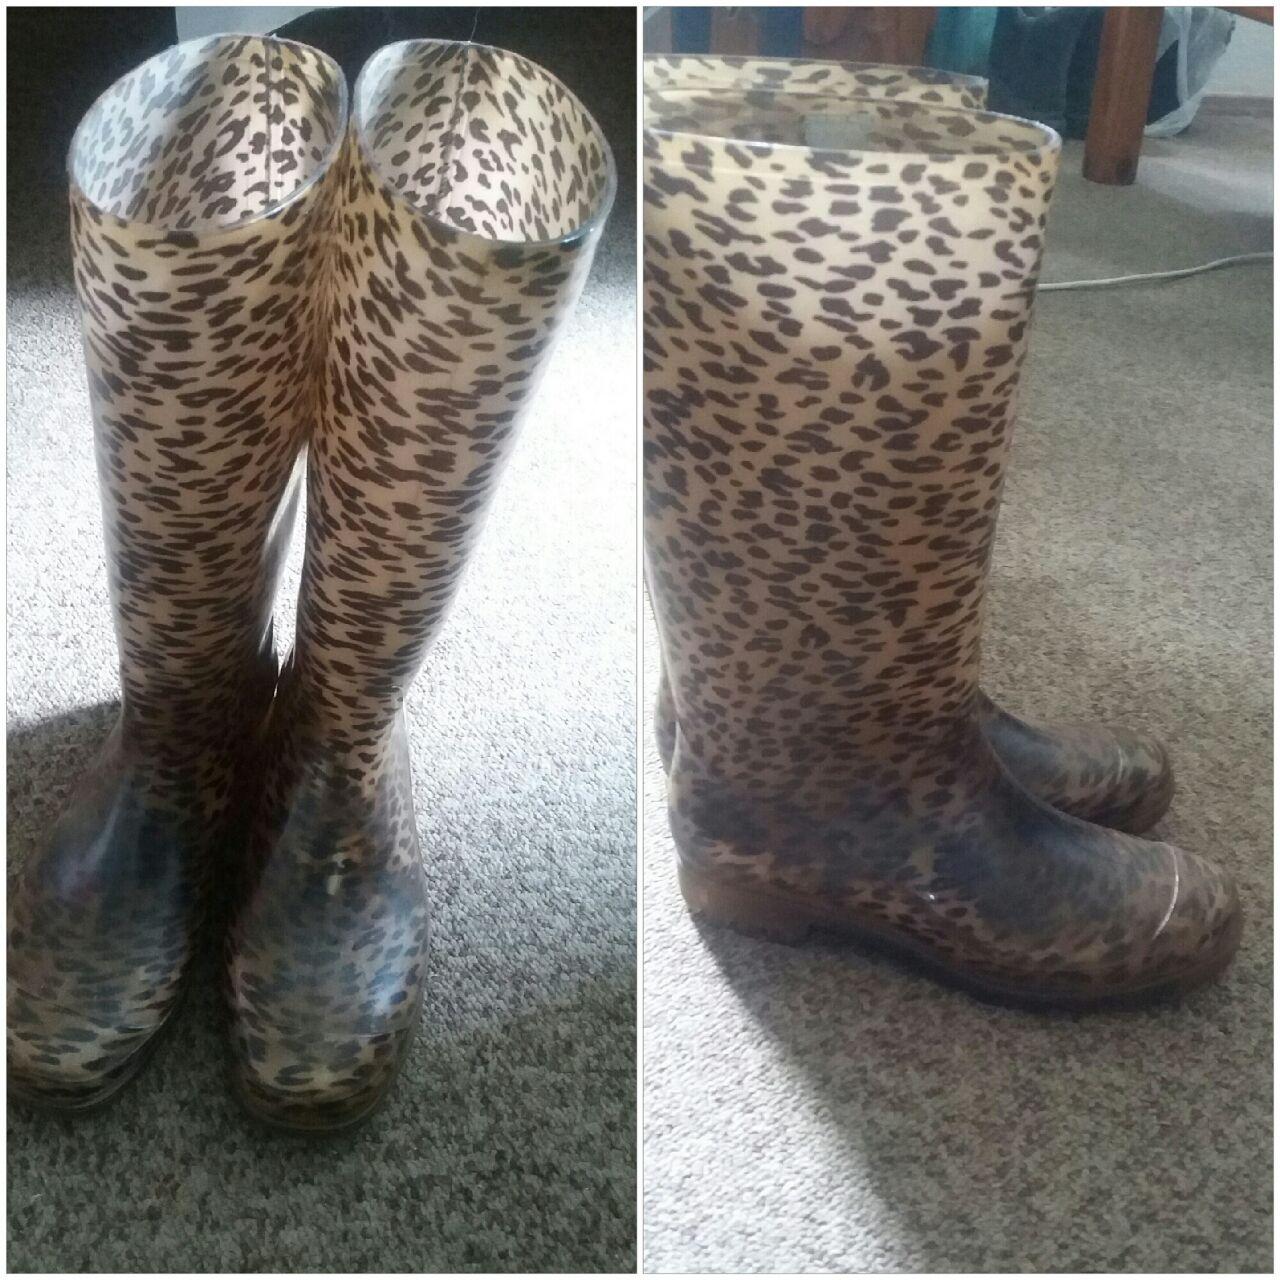 my leopard print wellies